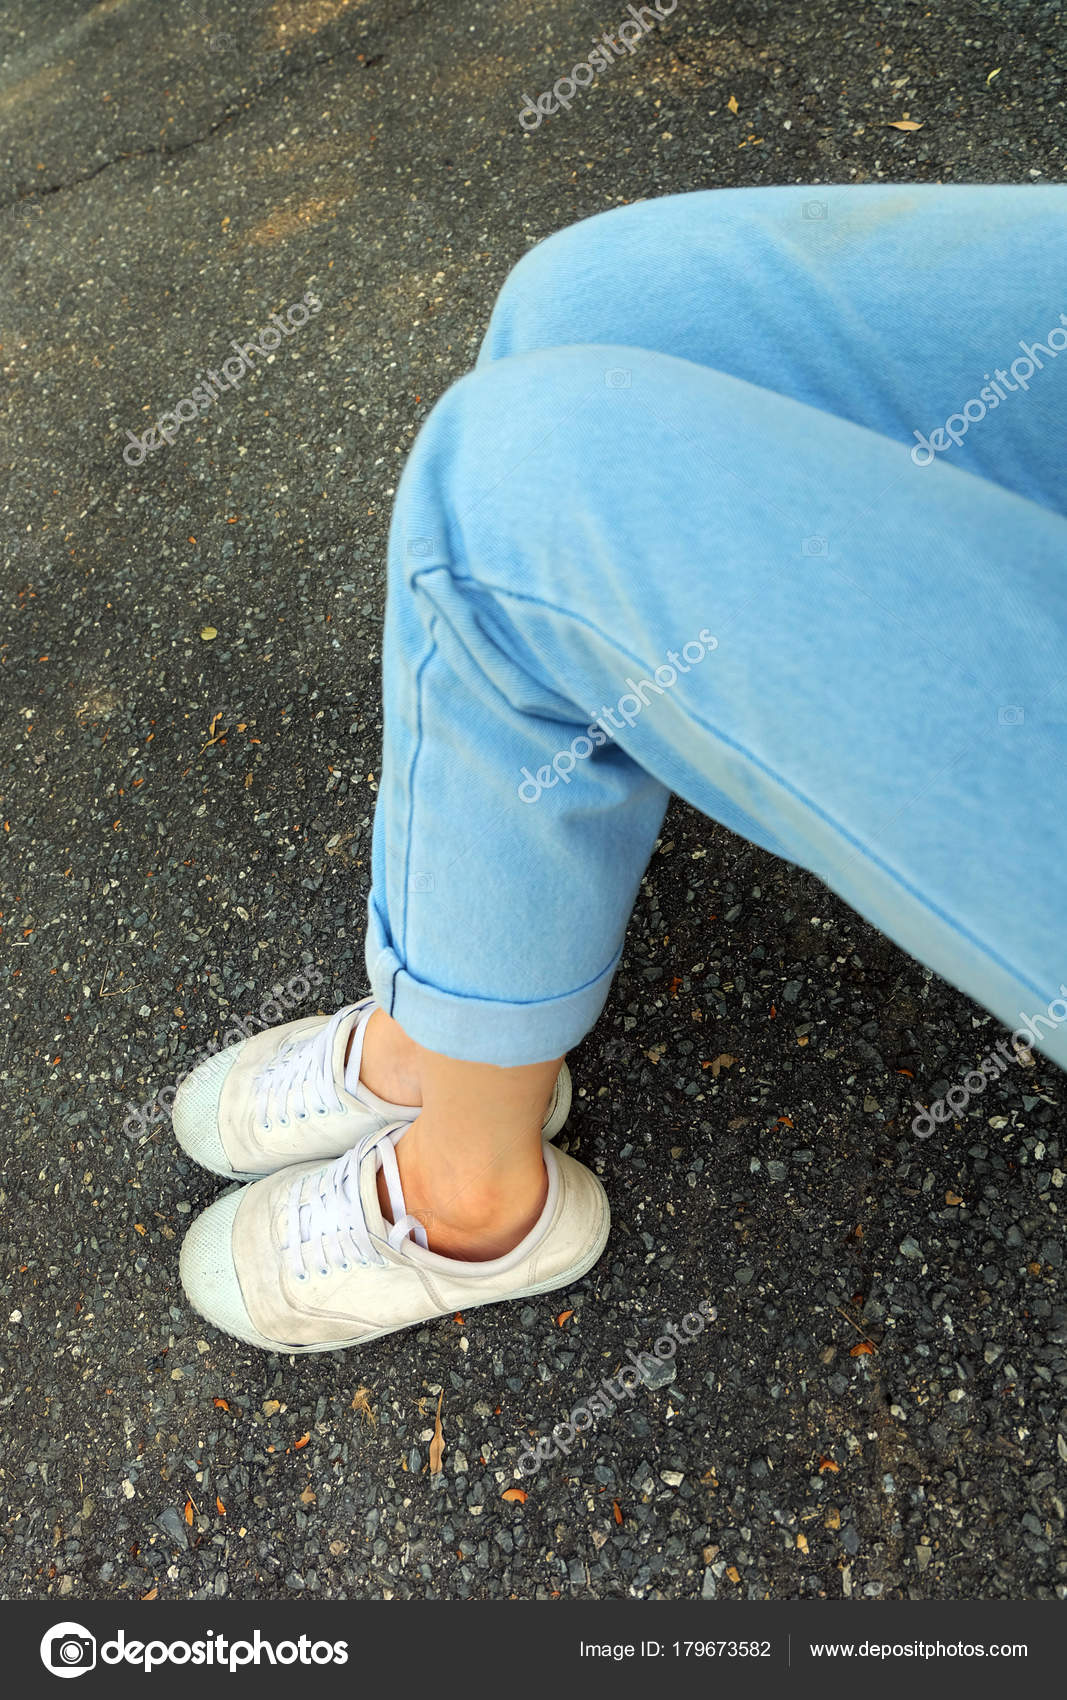 Blanco Blancas Zapatillas Zapatos Ropa Azul Selfie Close Mujer Jeans tsQrhdC